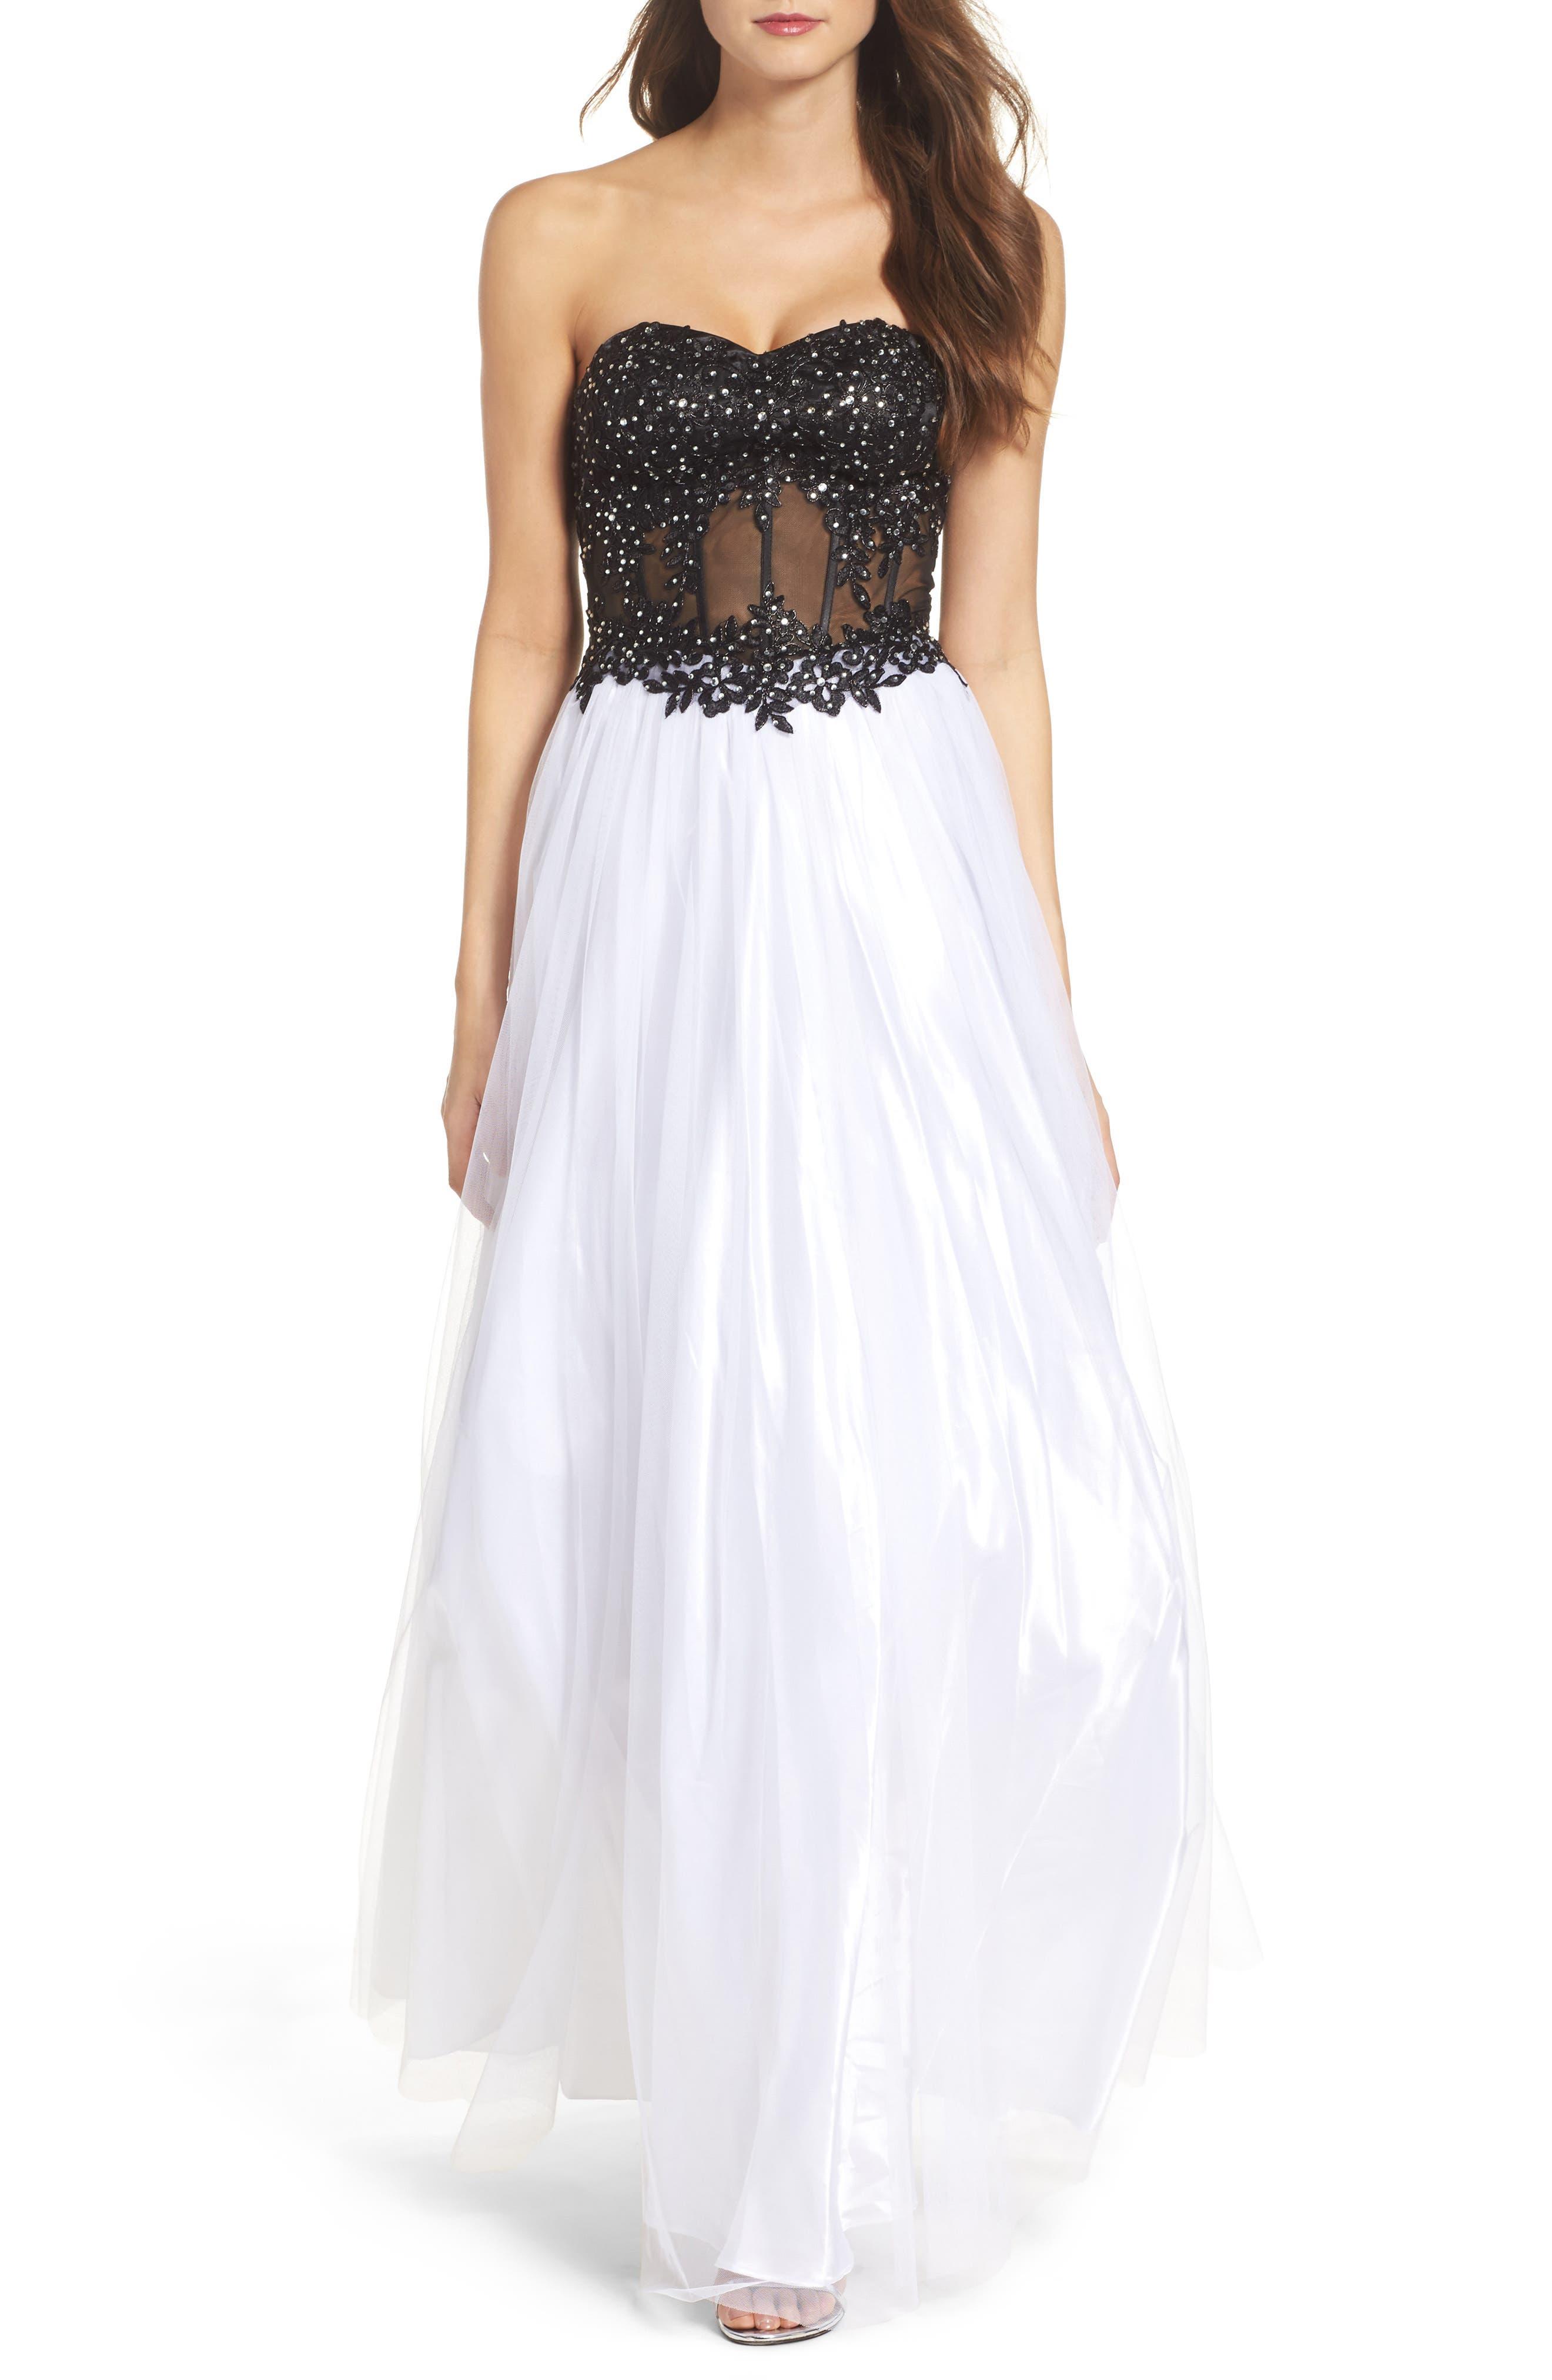 Main Image - Blondie Nites Strapless Bustier Gown